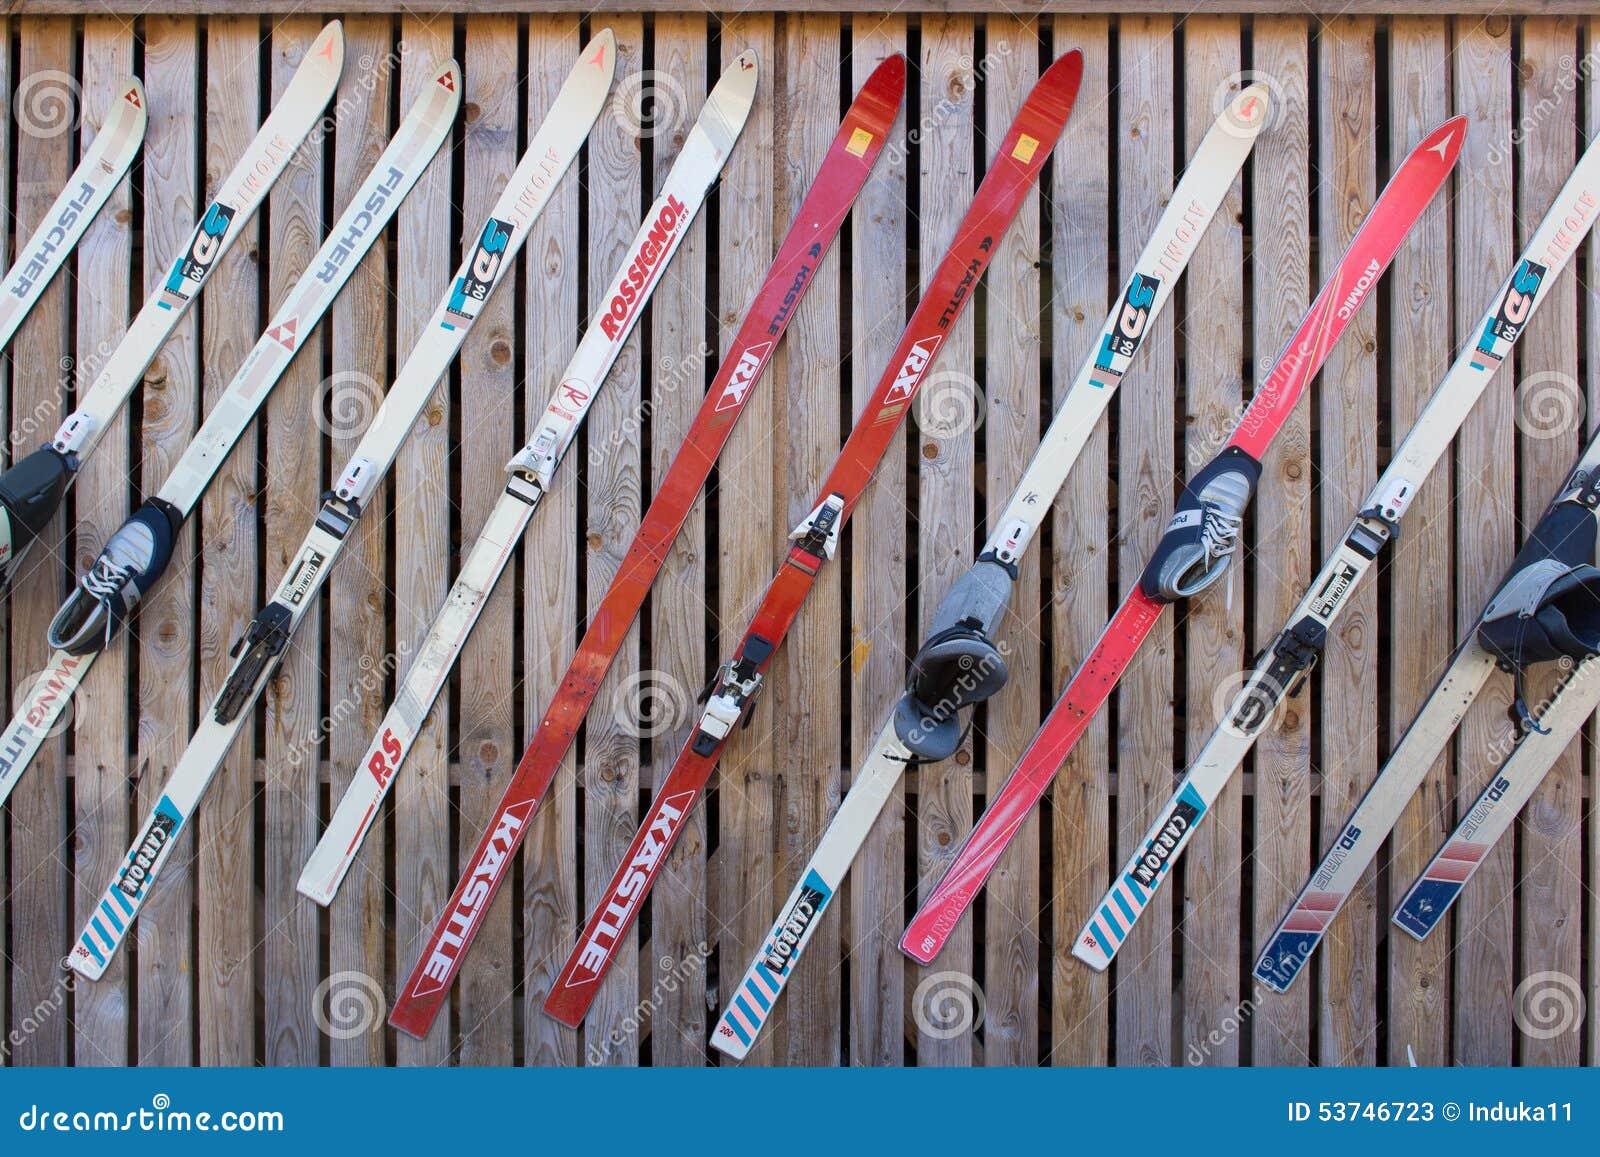 uk saatavuus myynti erilaisia värejä Vintage skis editorial stock photo. Image of karhu, skis ...